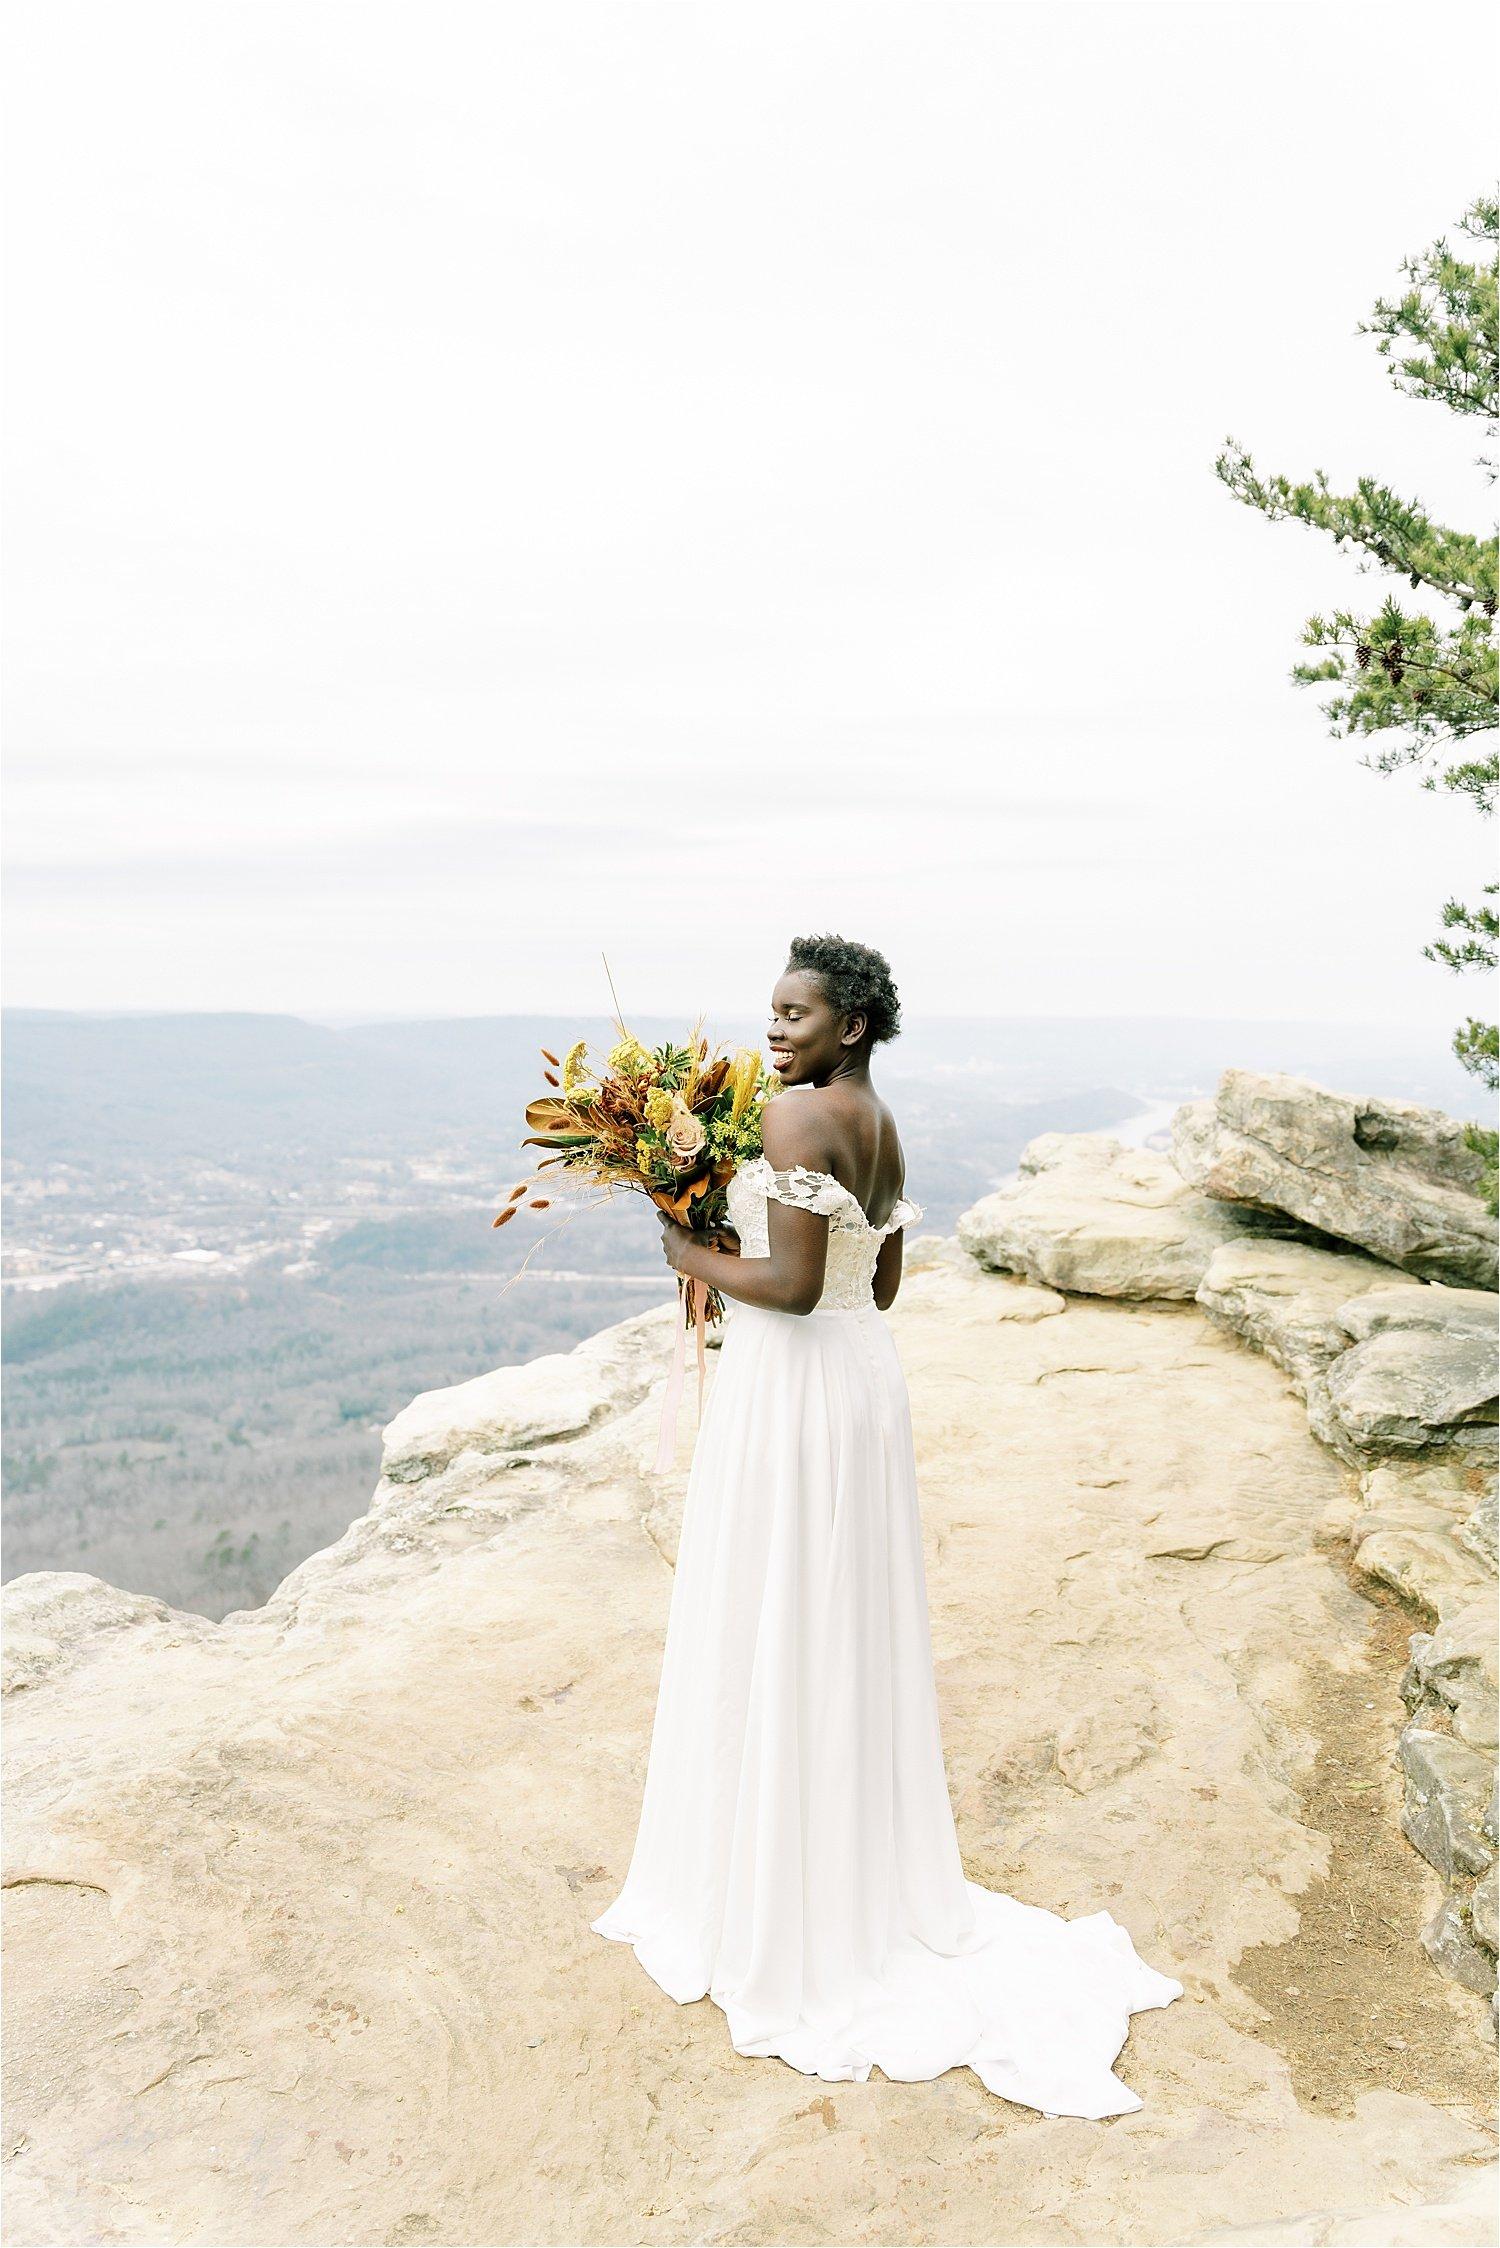 Chattanooga elopement photographer